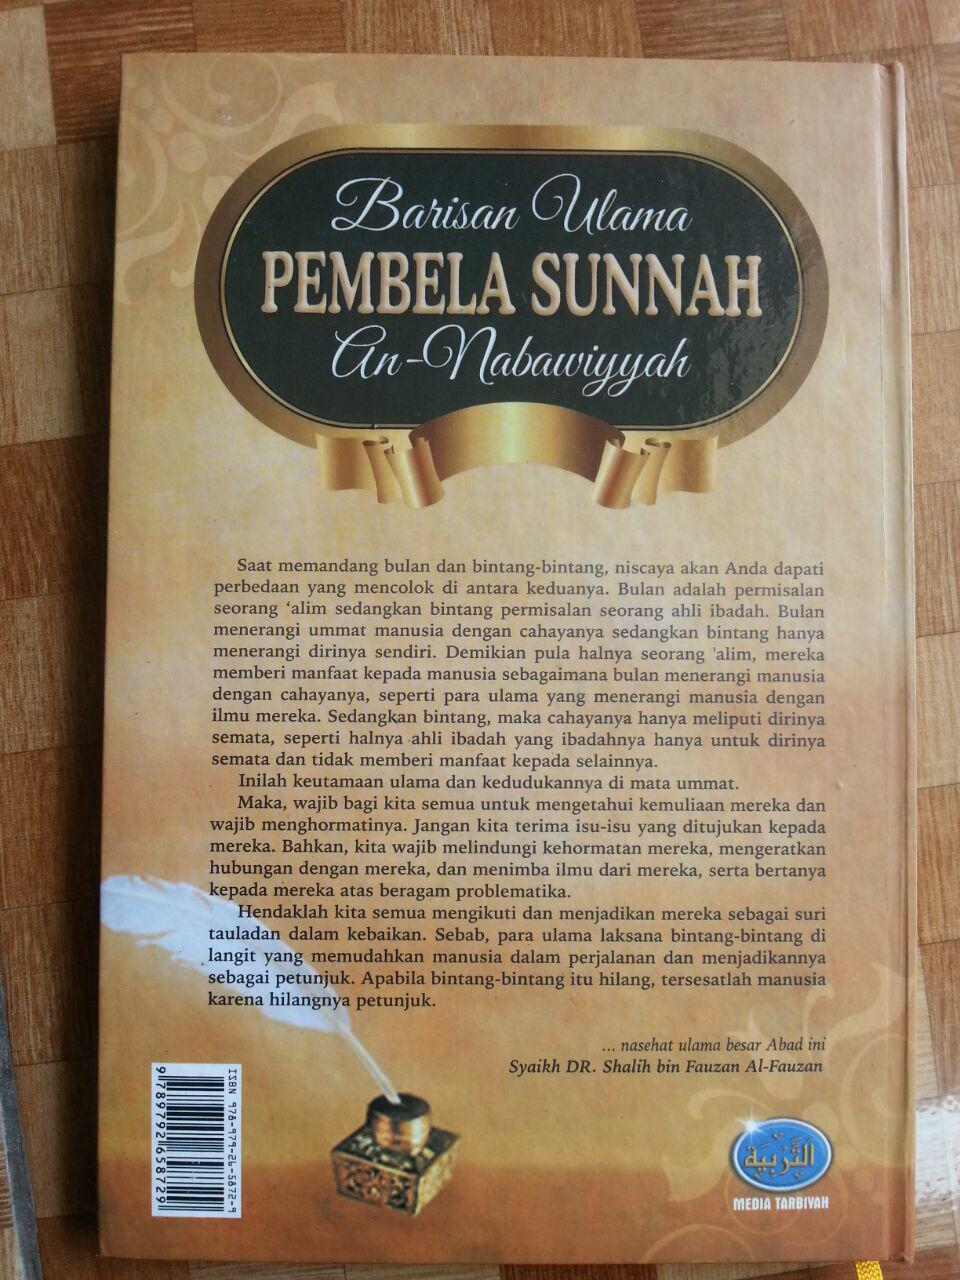 Buku Barisan Ulama Pembela Sunnah An-Nabawiyyah cover